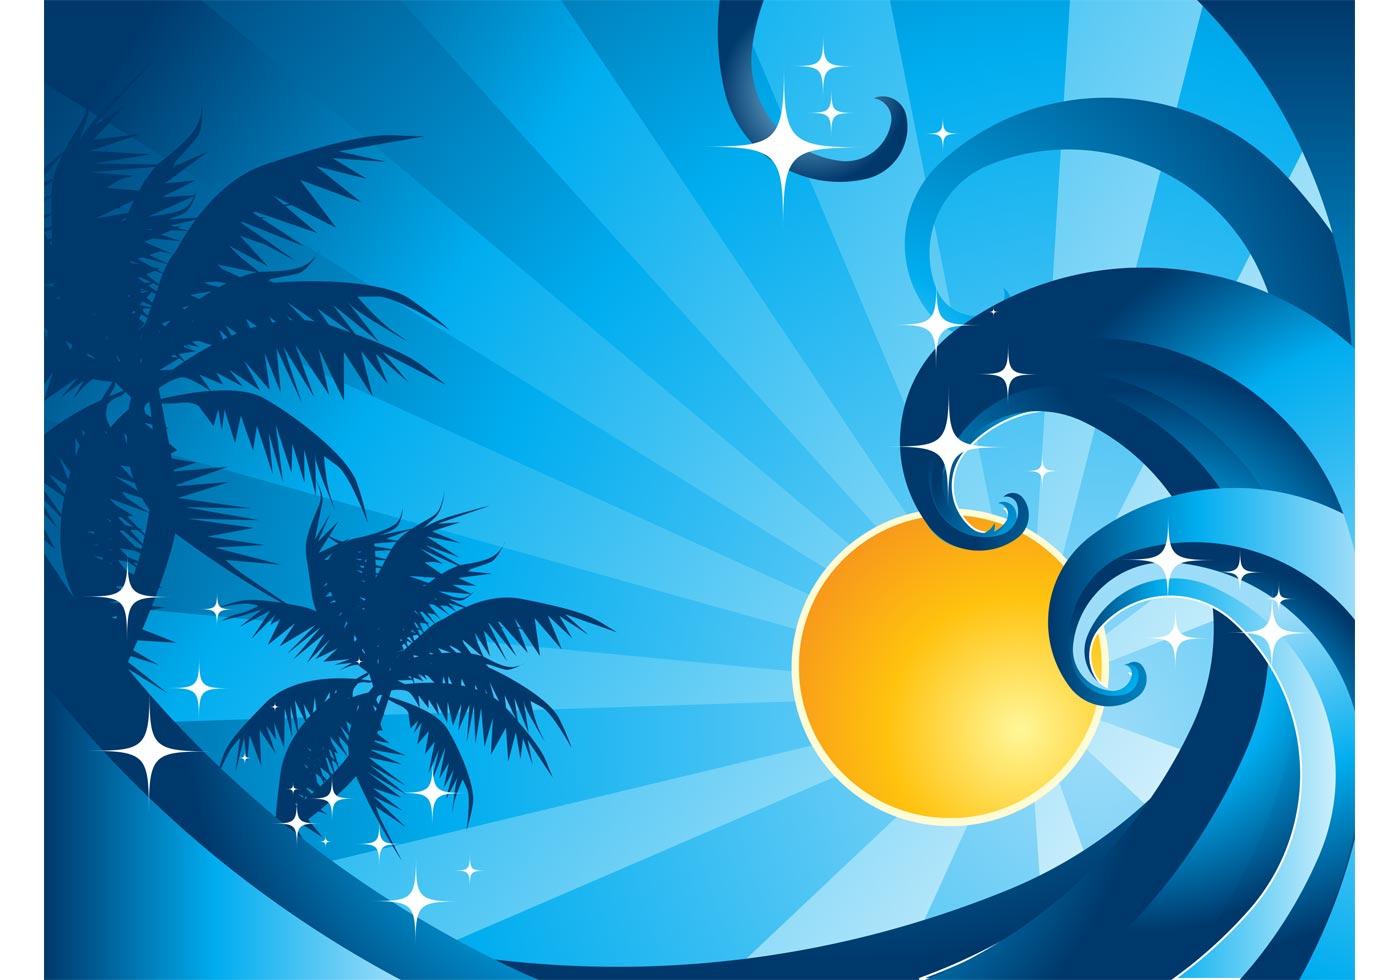 Sea Wave Vector - Download Free Vector Art, Stock Graphics ...